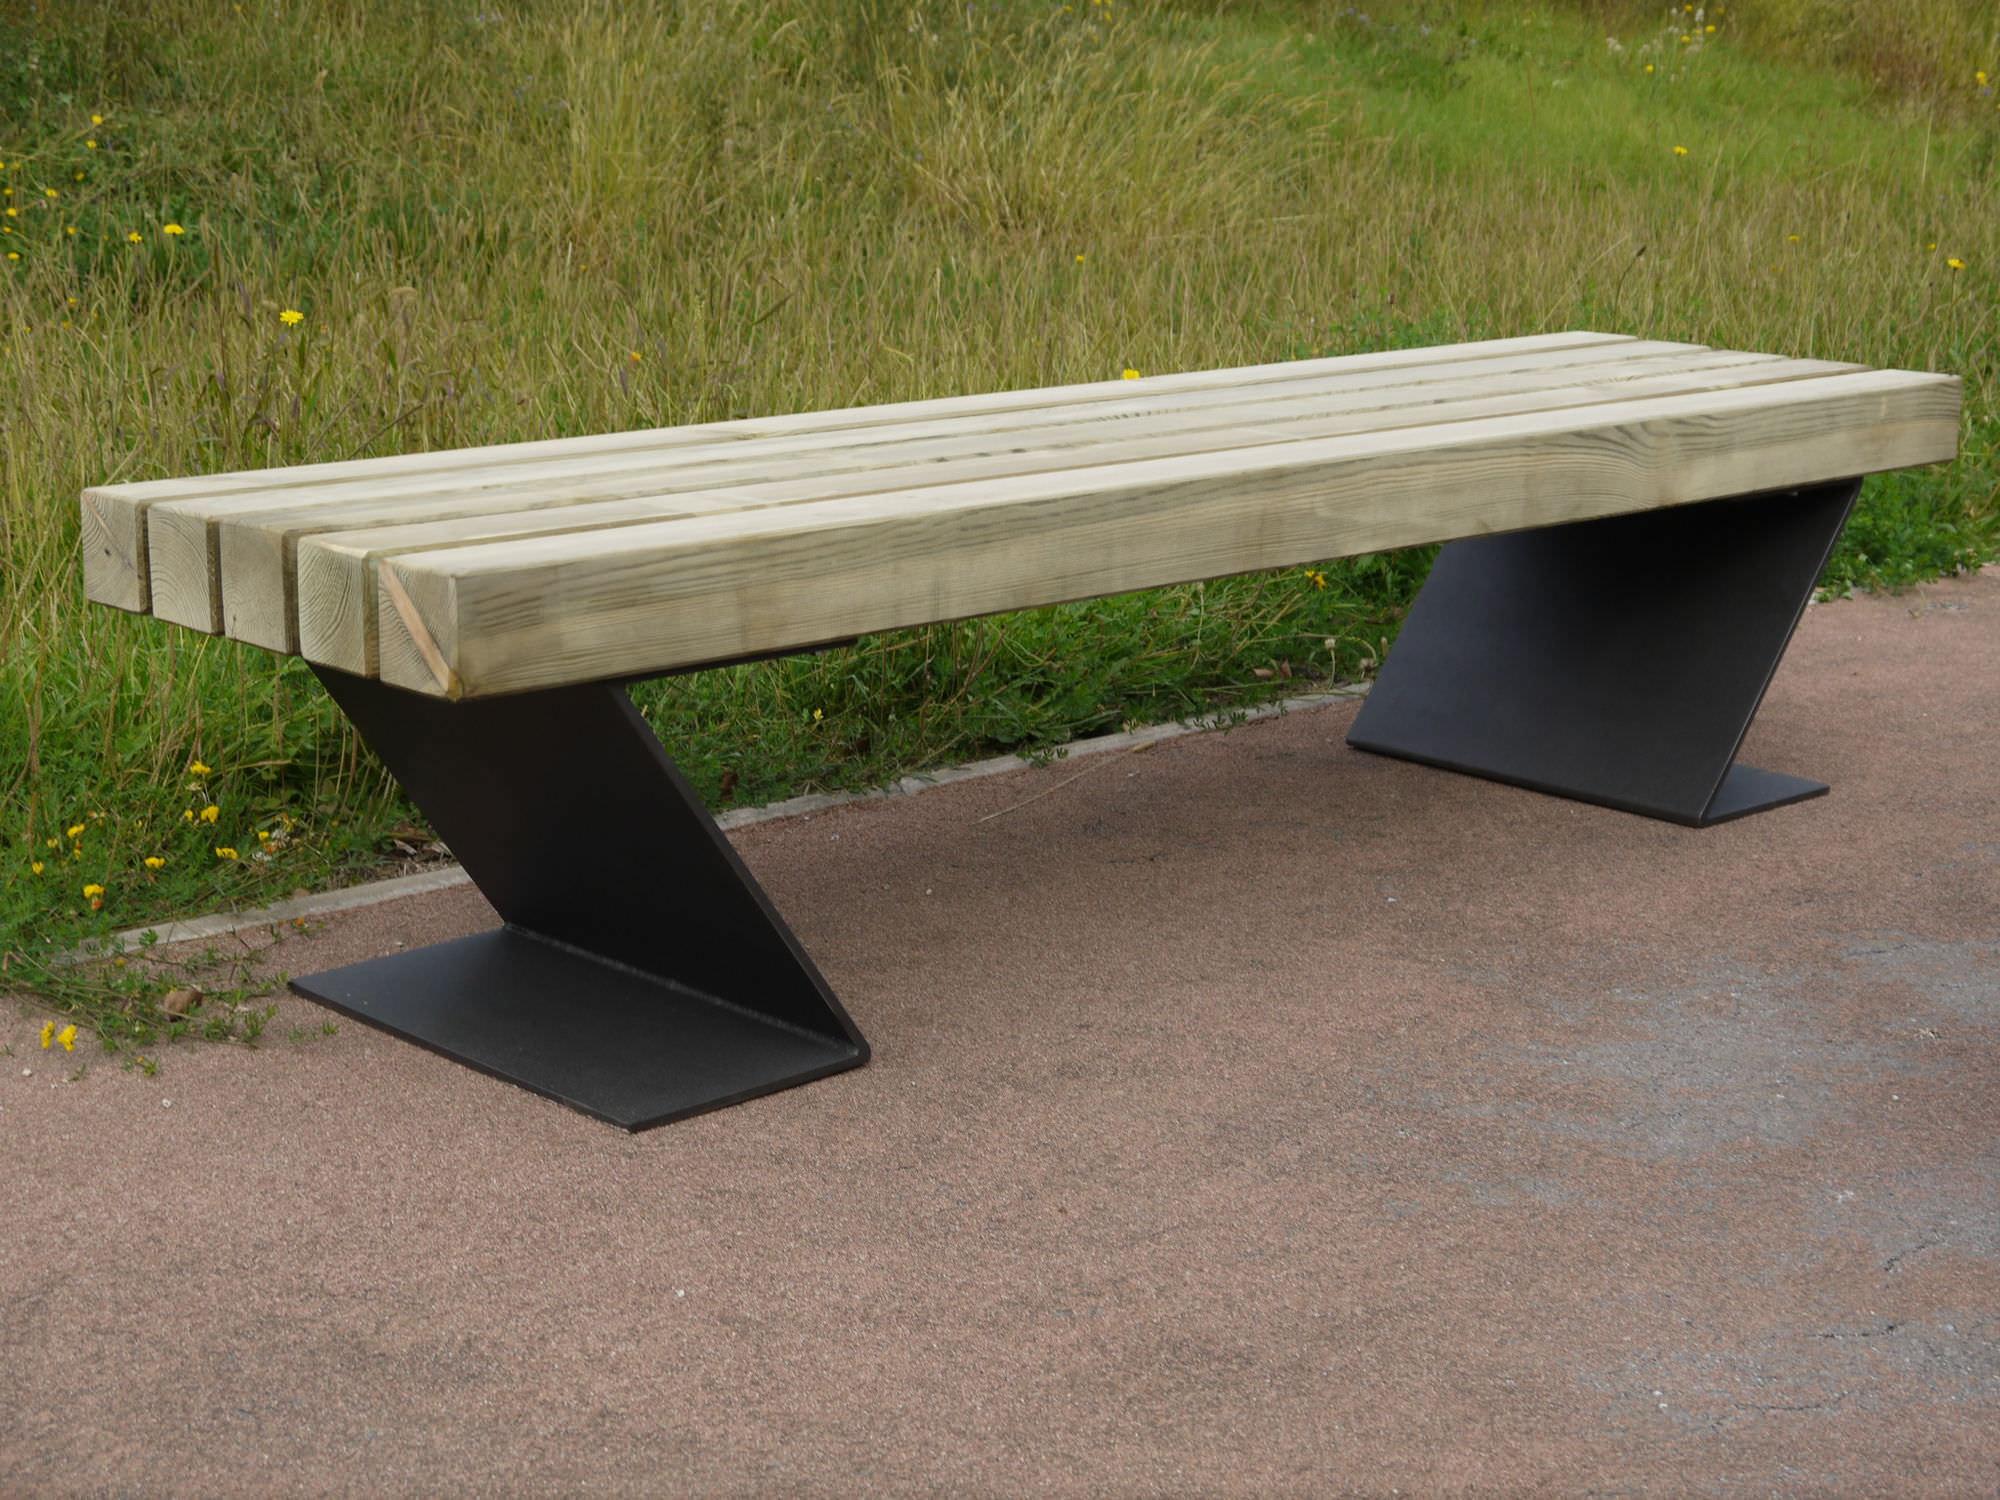 public bench / contemporary / wooden / metal - ecobatfrepat